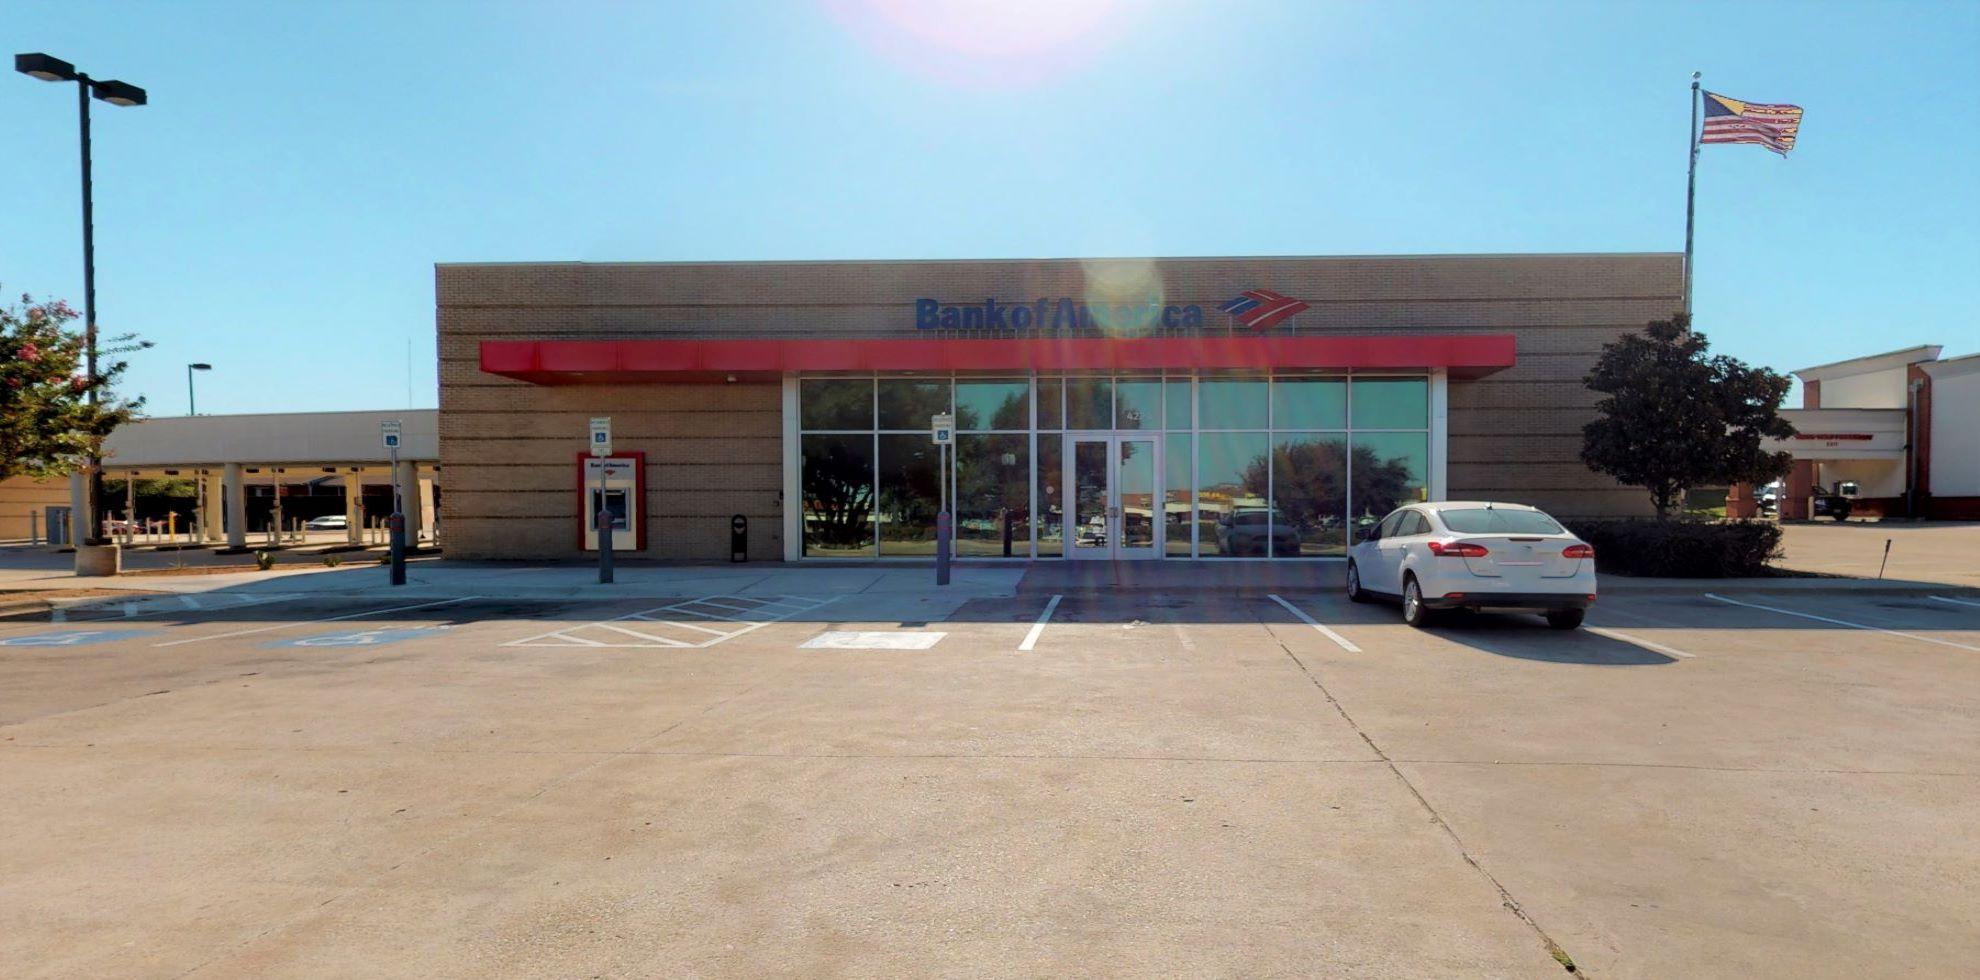 Bank of America financial center with drive-thru ATM and teller   4220 W Green Oaks Blvd, Arlington, TX 76016